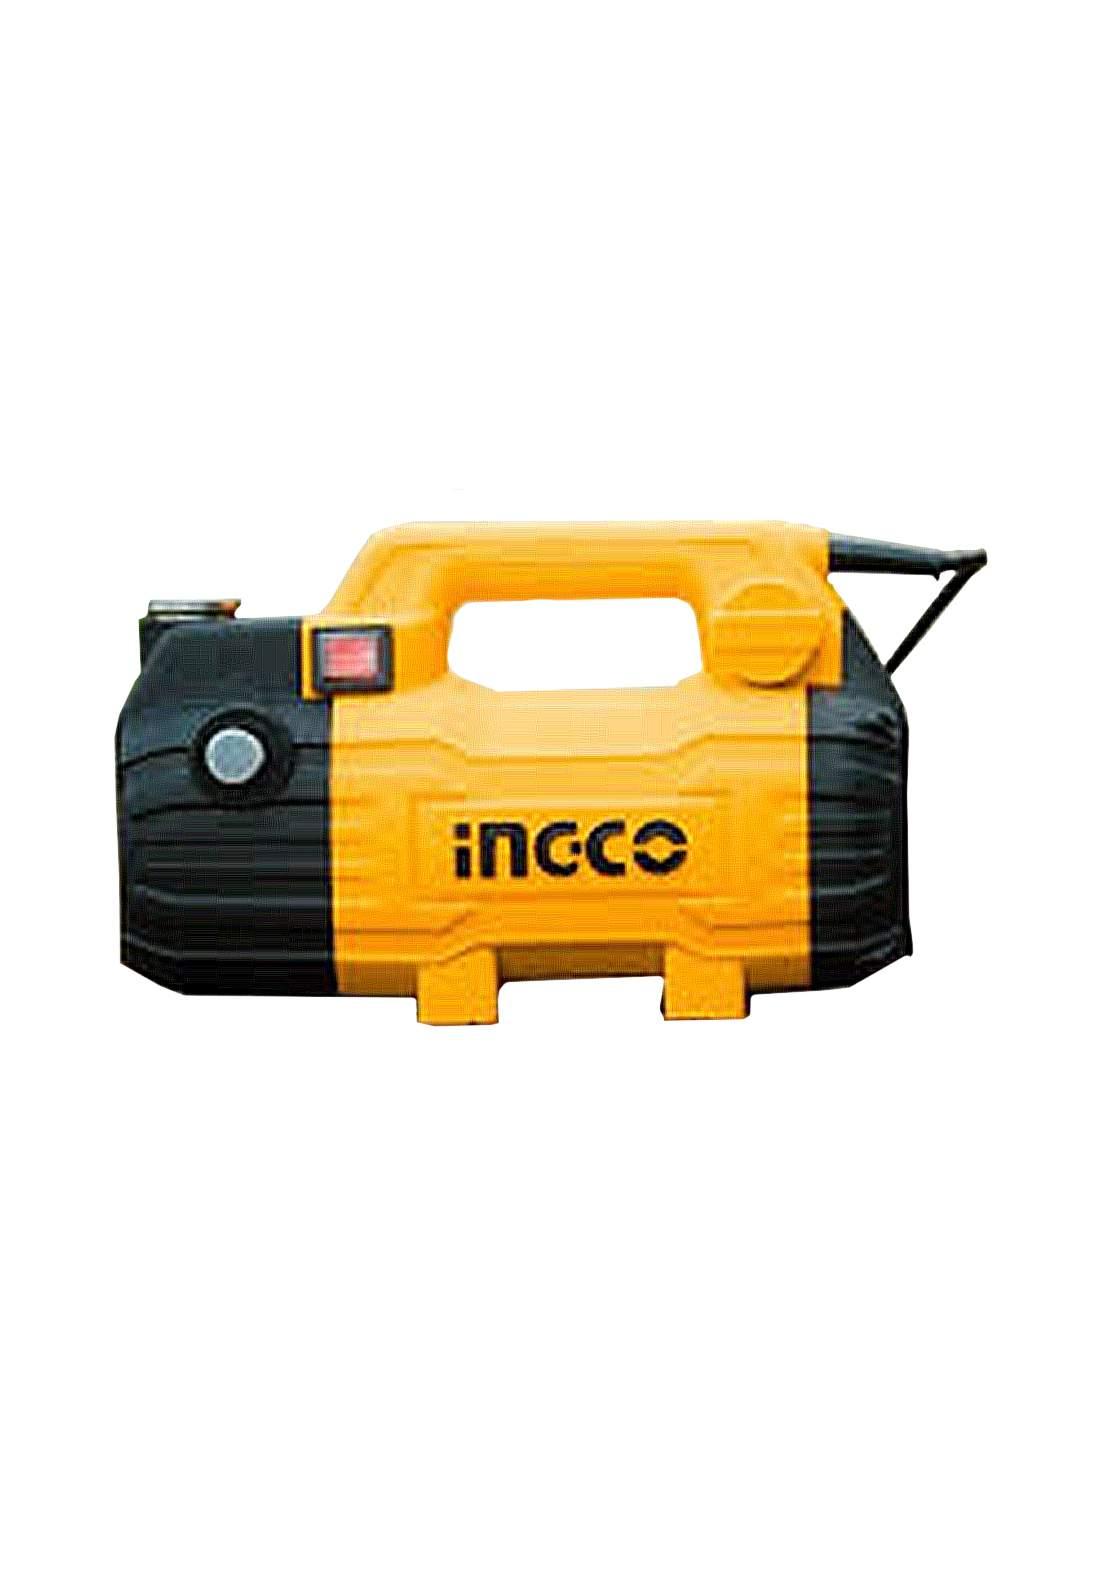 Ingco Hpwr15028 High Pressure Washer  مضخة ضغط عالي